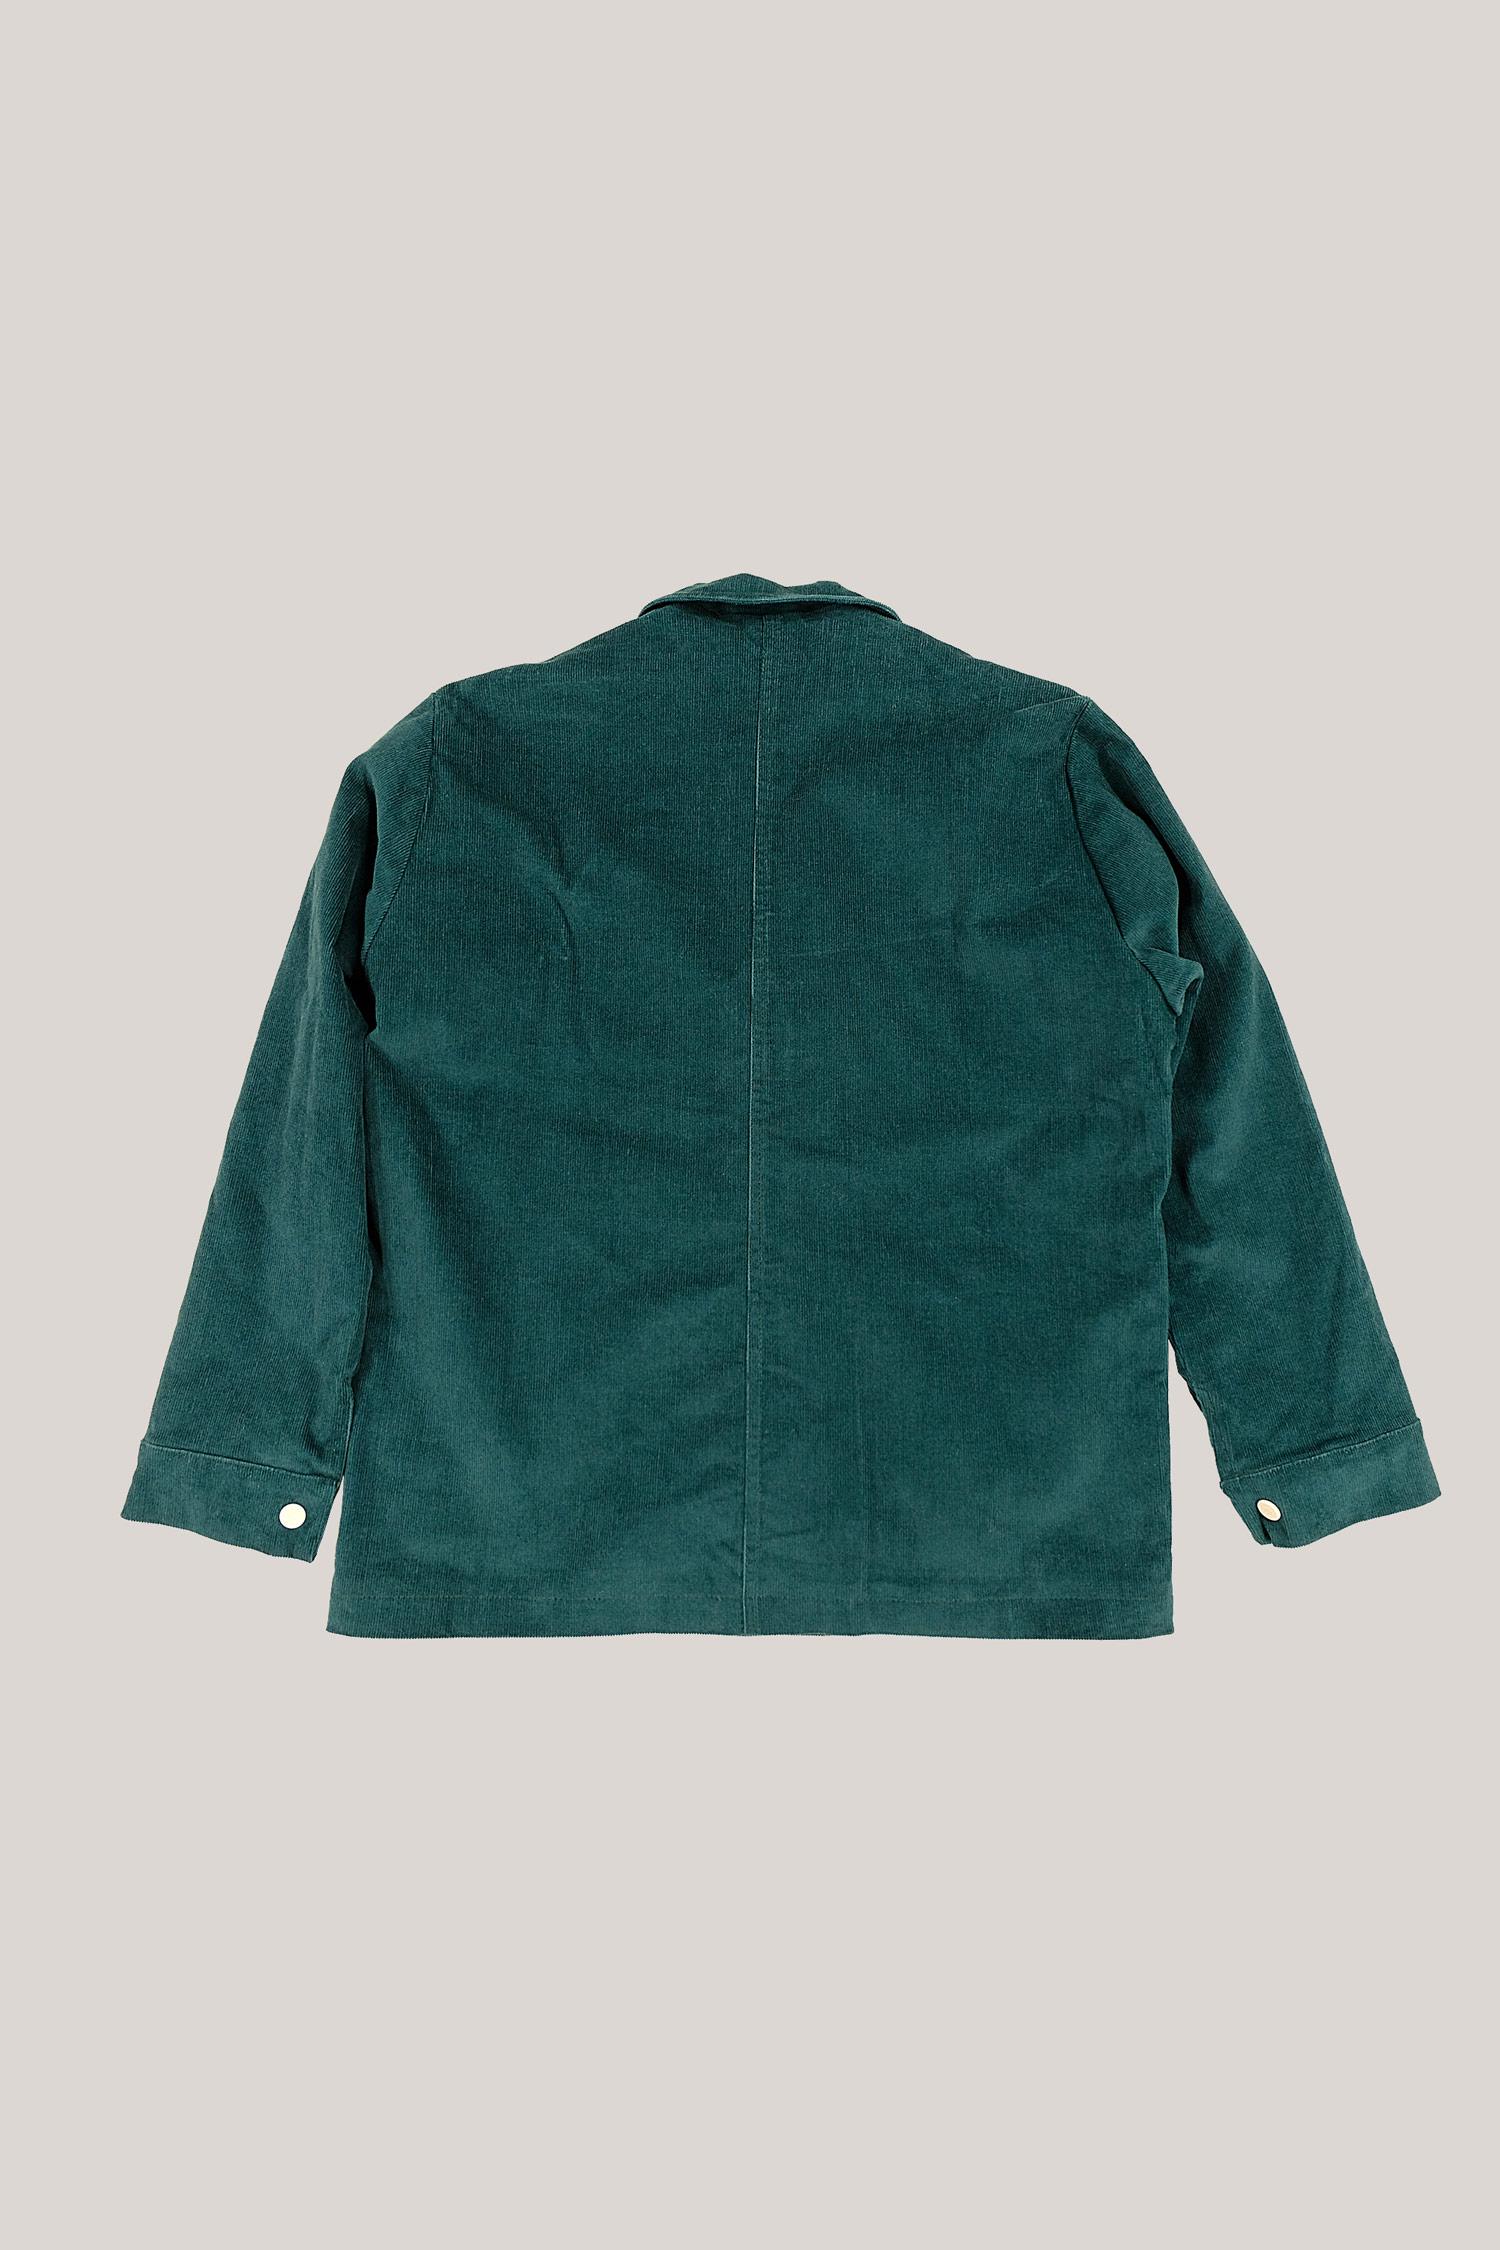 32-Green-Cord-Jacket-2